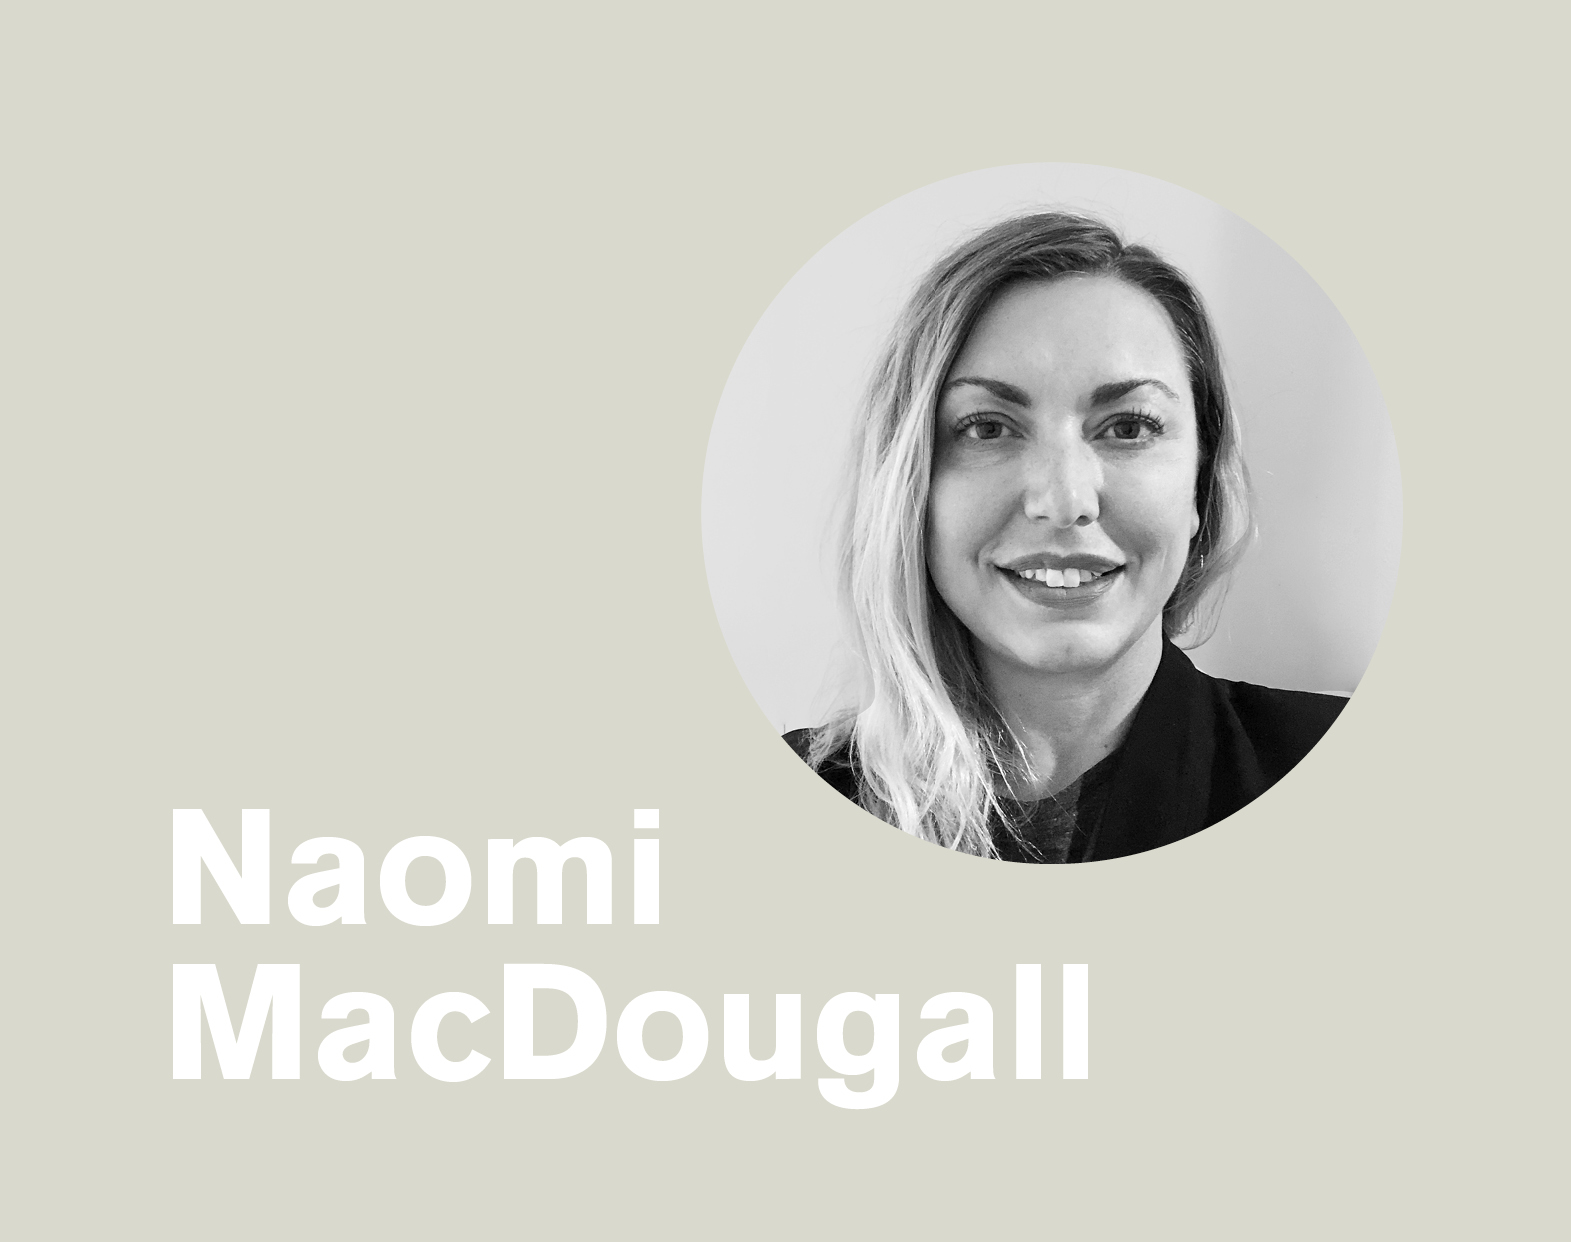 Naomi MacDougall